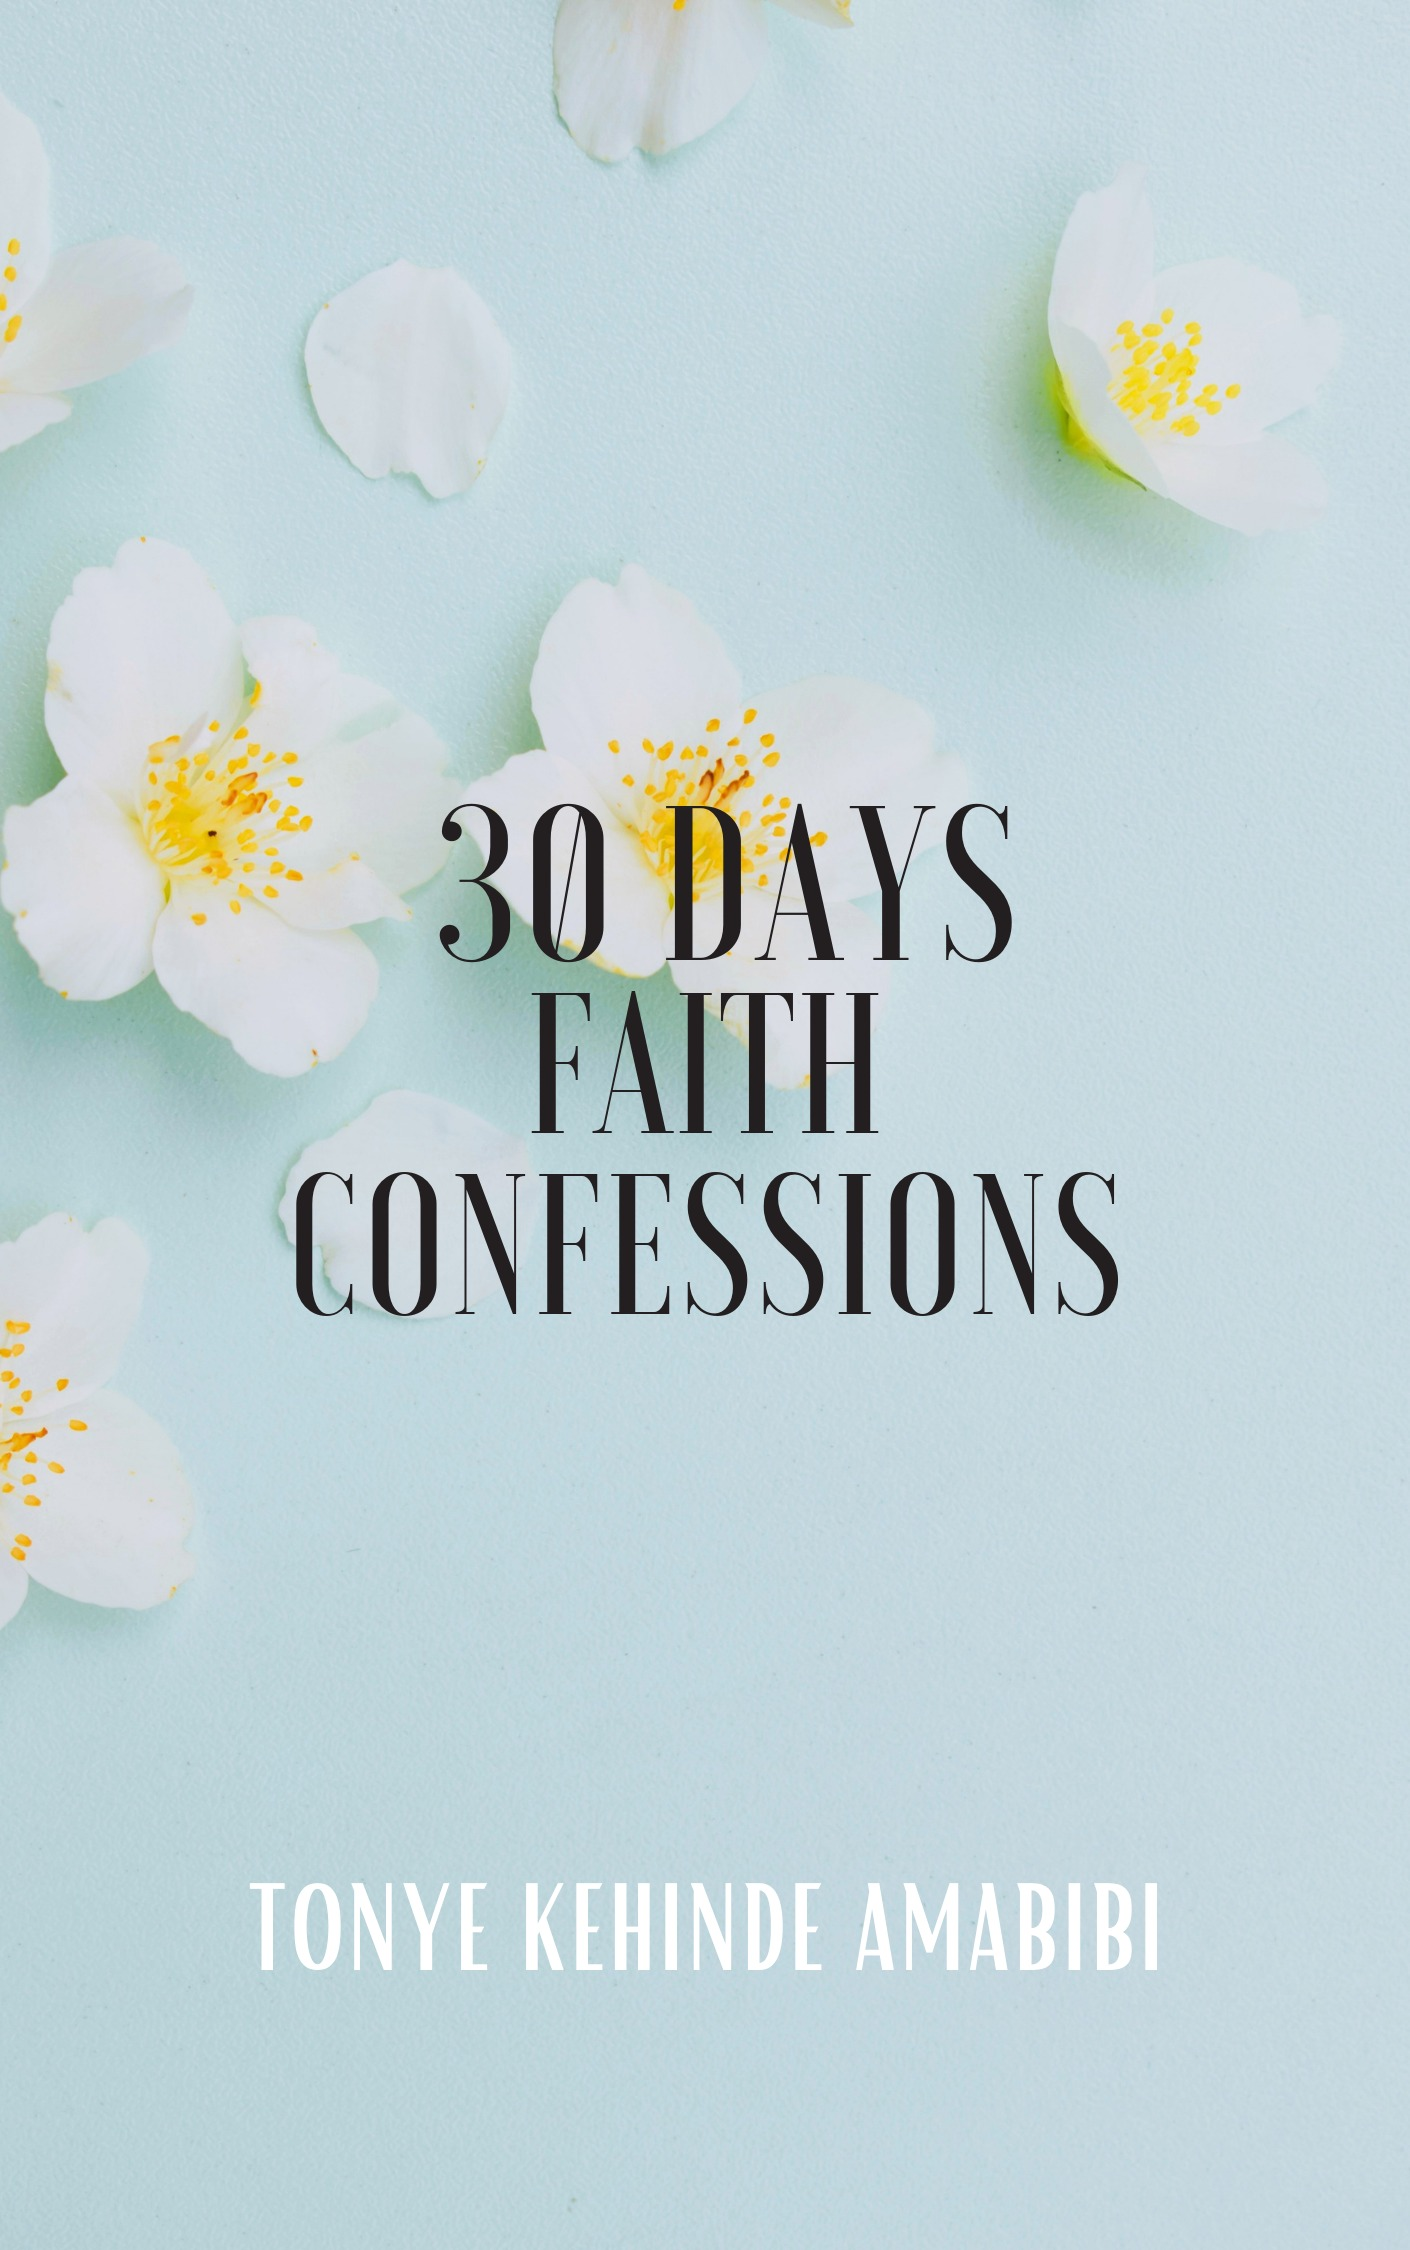 30 Days Faith Confessions